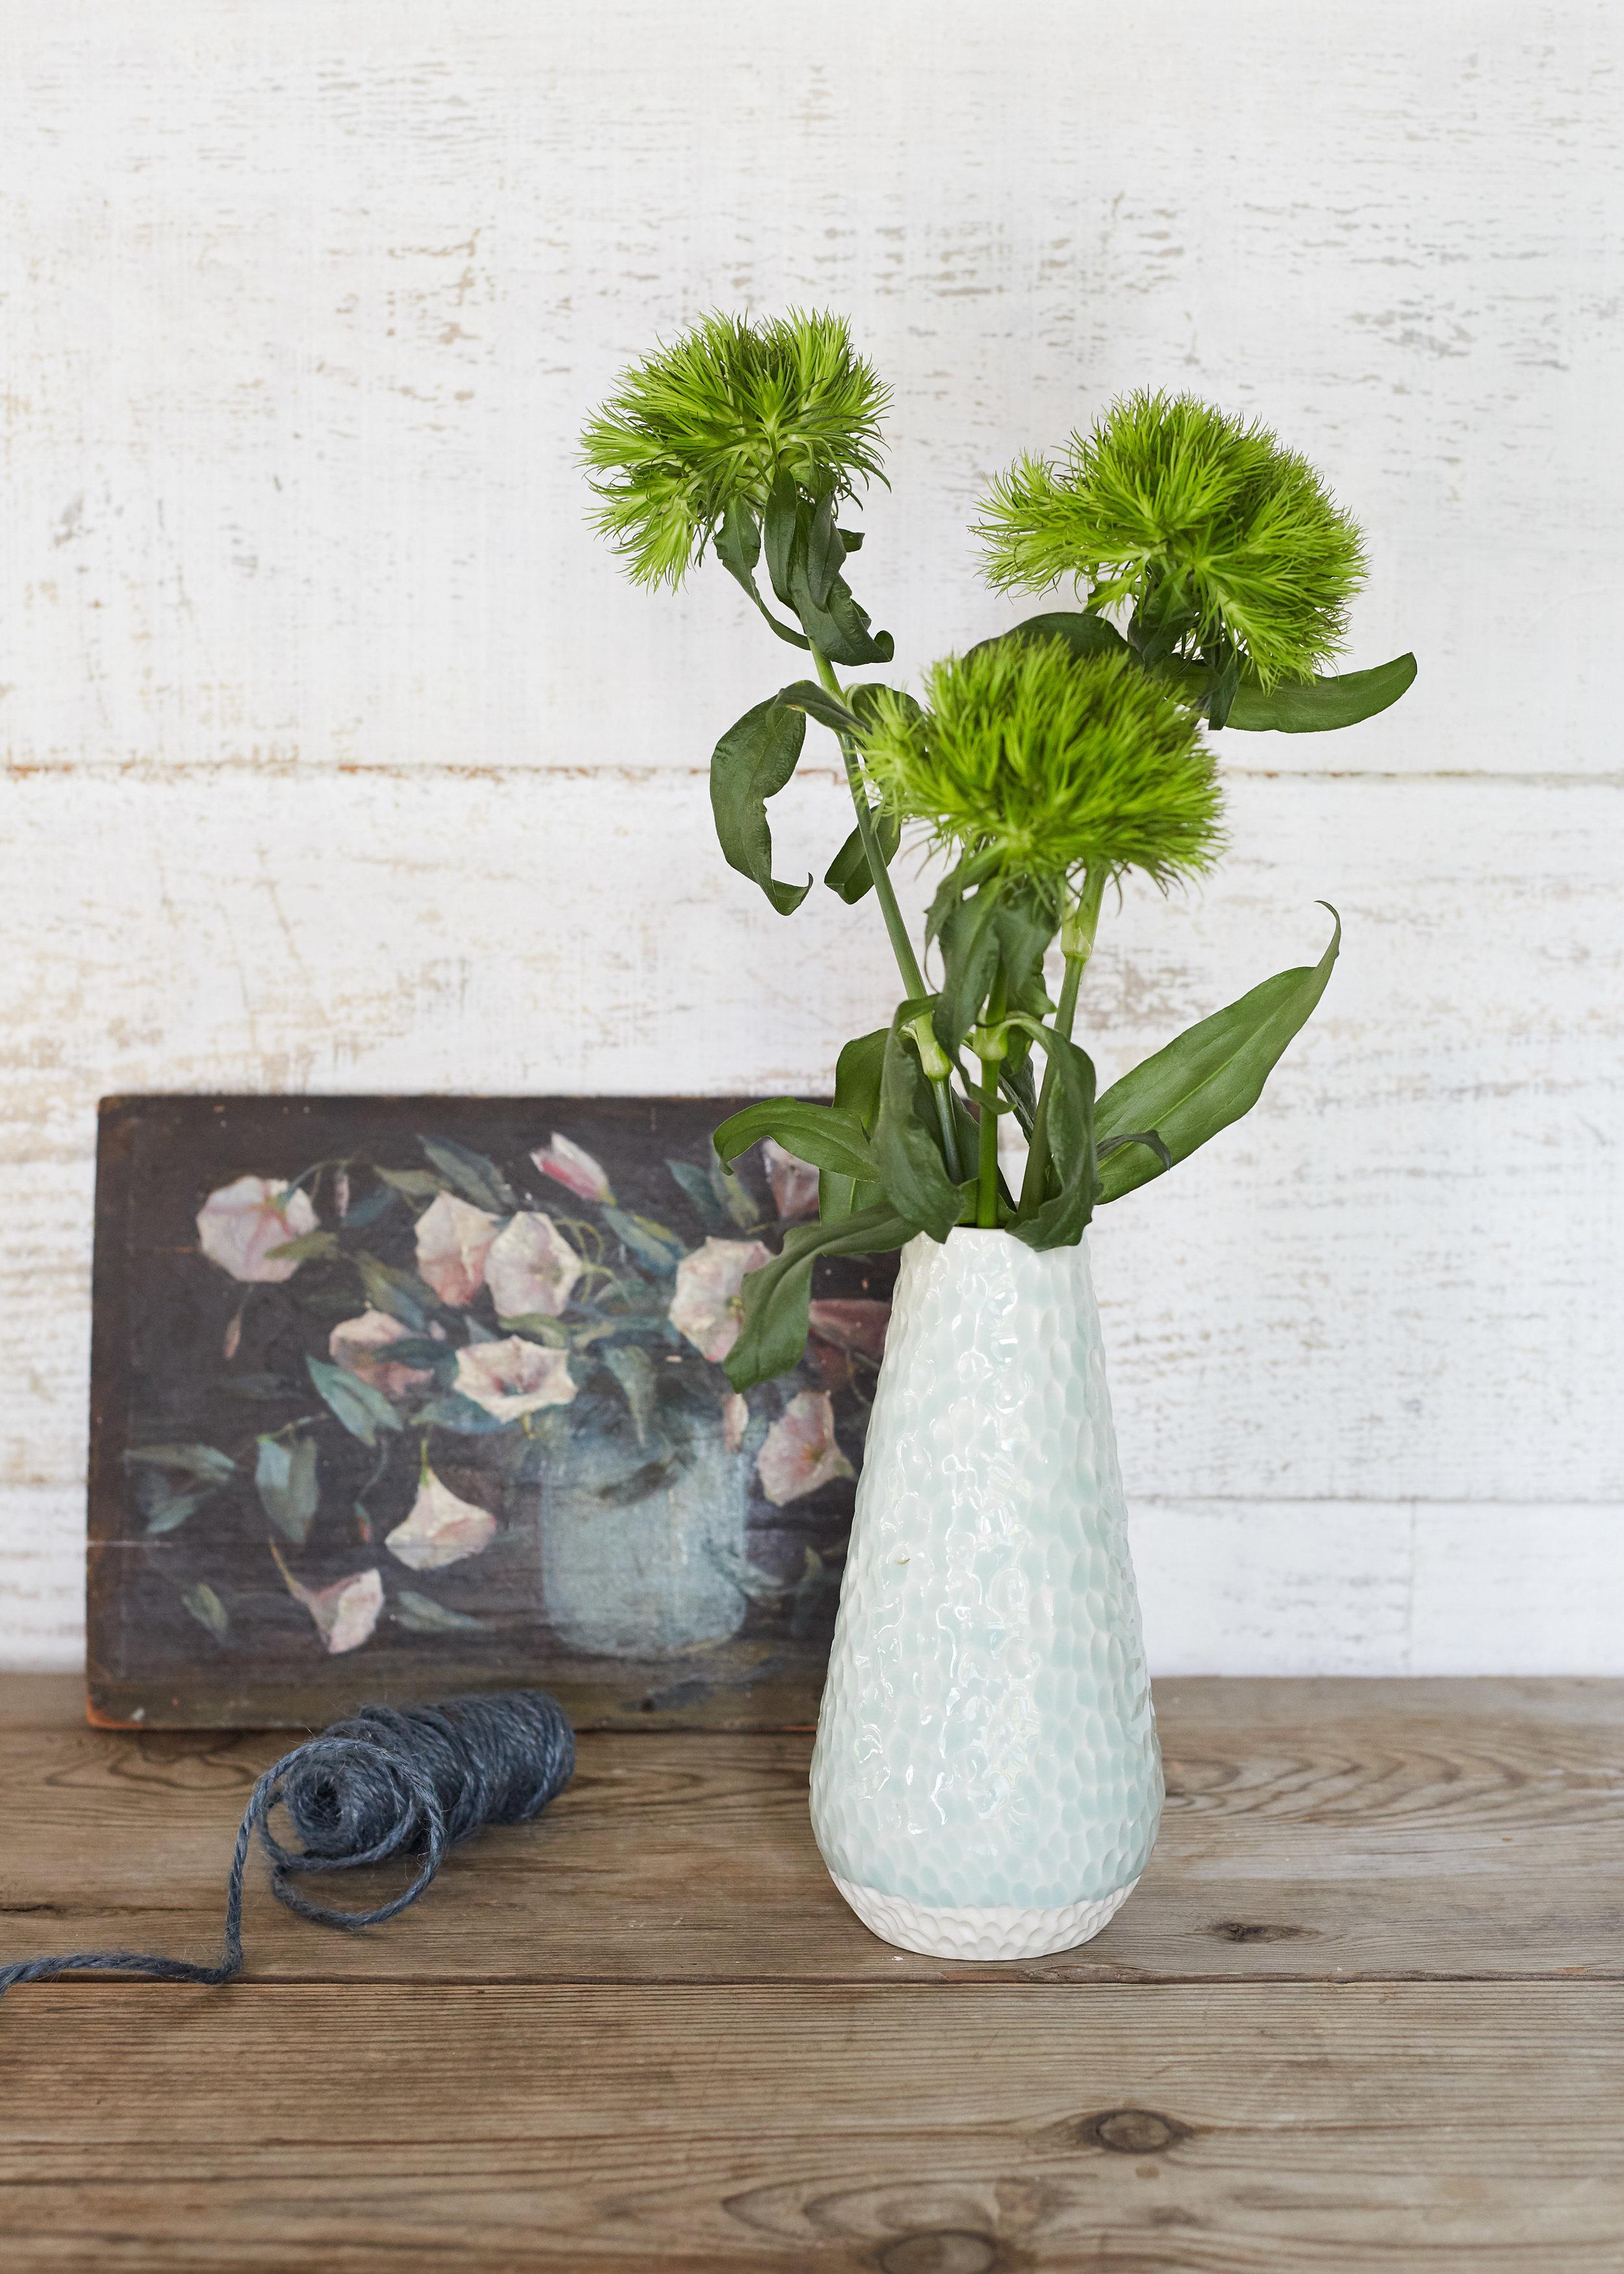 Clara-Castner-porcelain carved celadon vase photo by Yeshen Venema.jpg